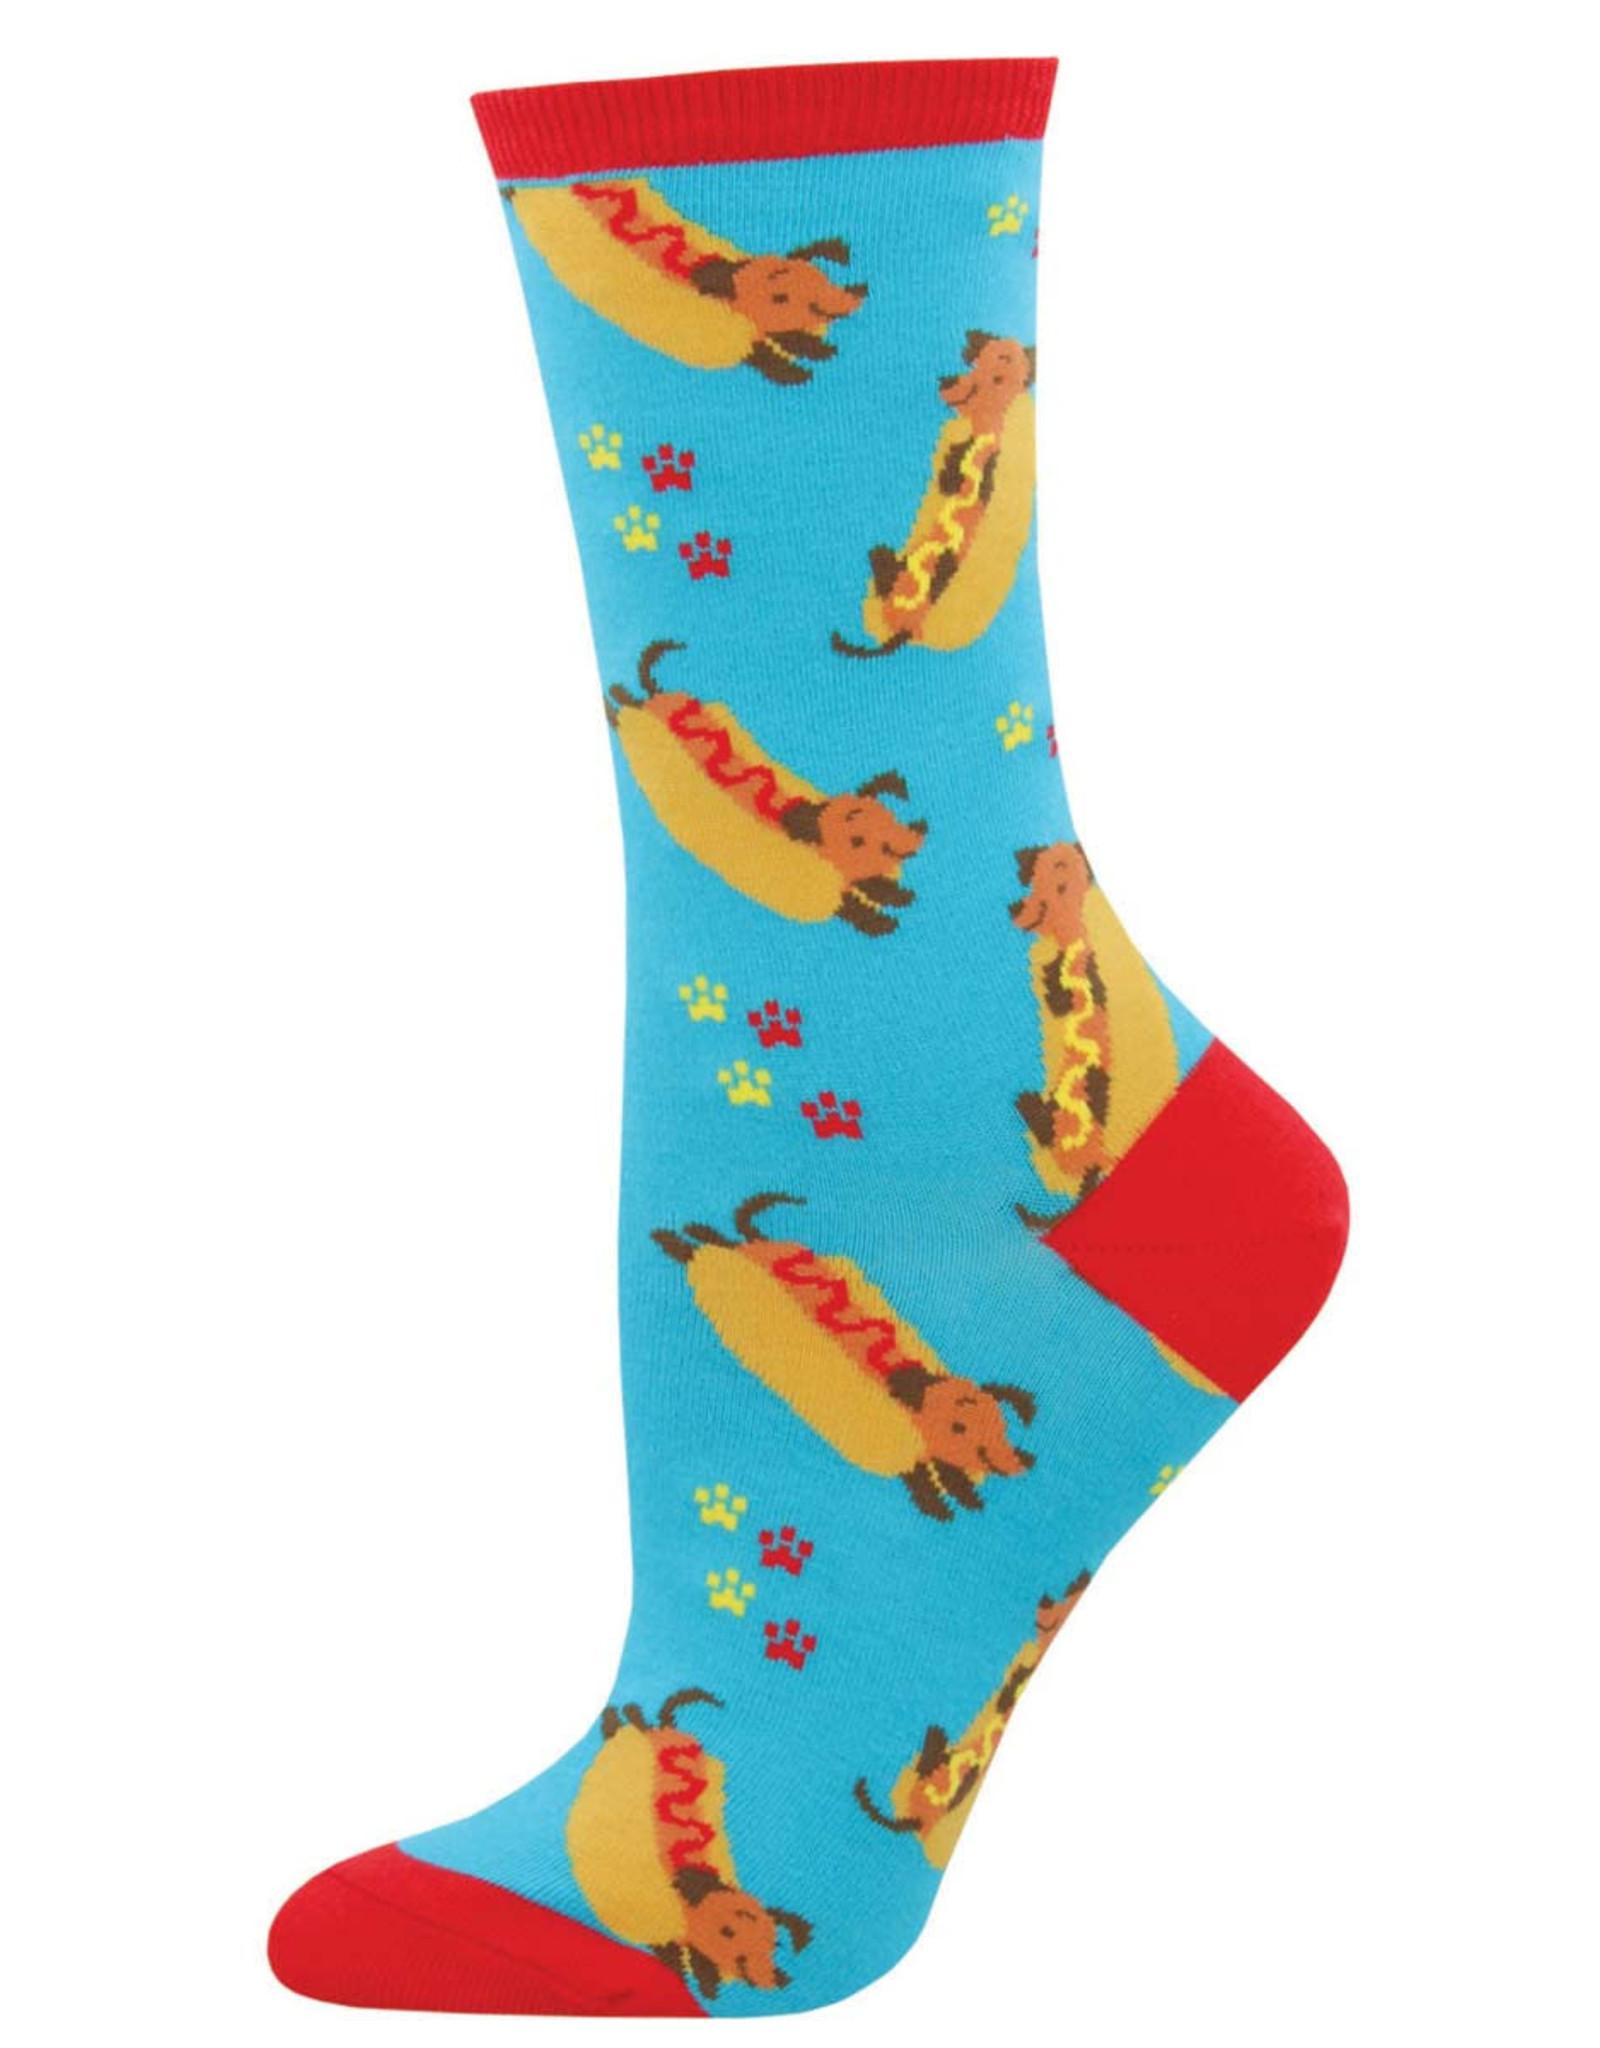 Socksmith Women's Wiener Dog Blue Socks